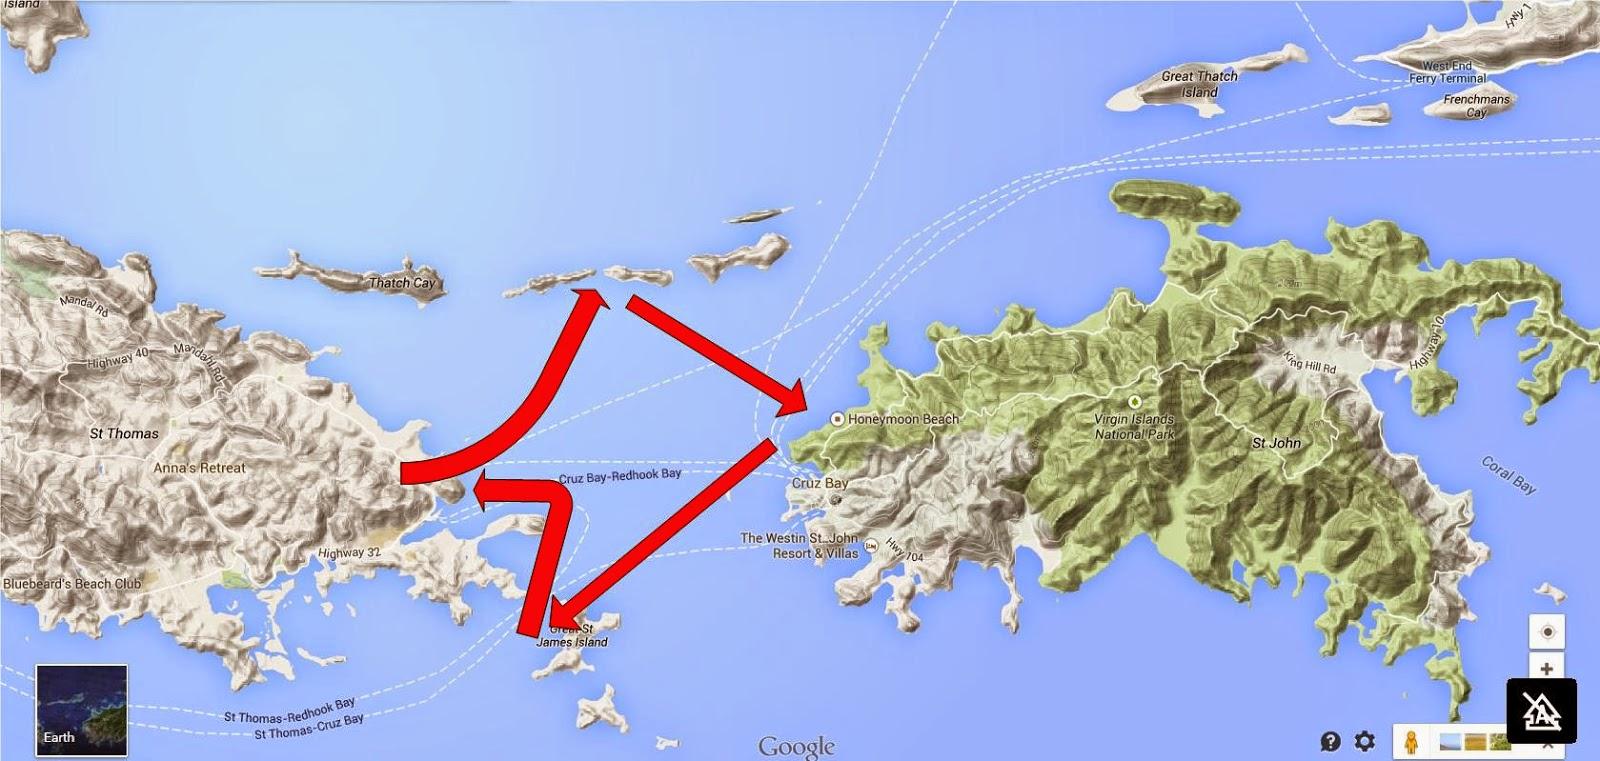 St John: Snorkeling & Snuba - Virgin Islands